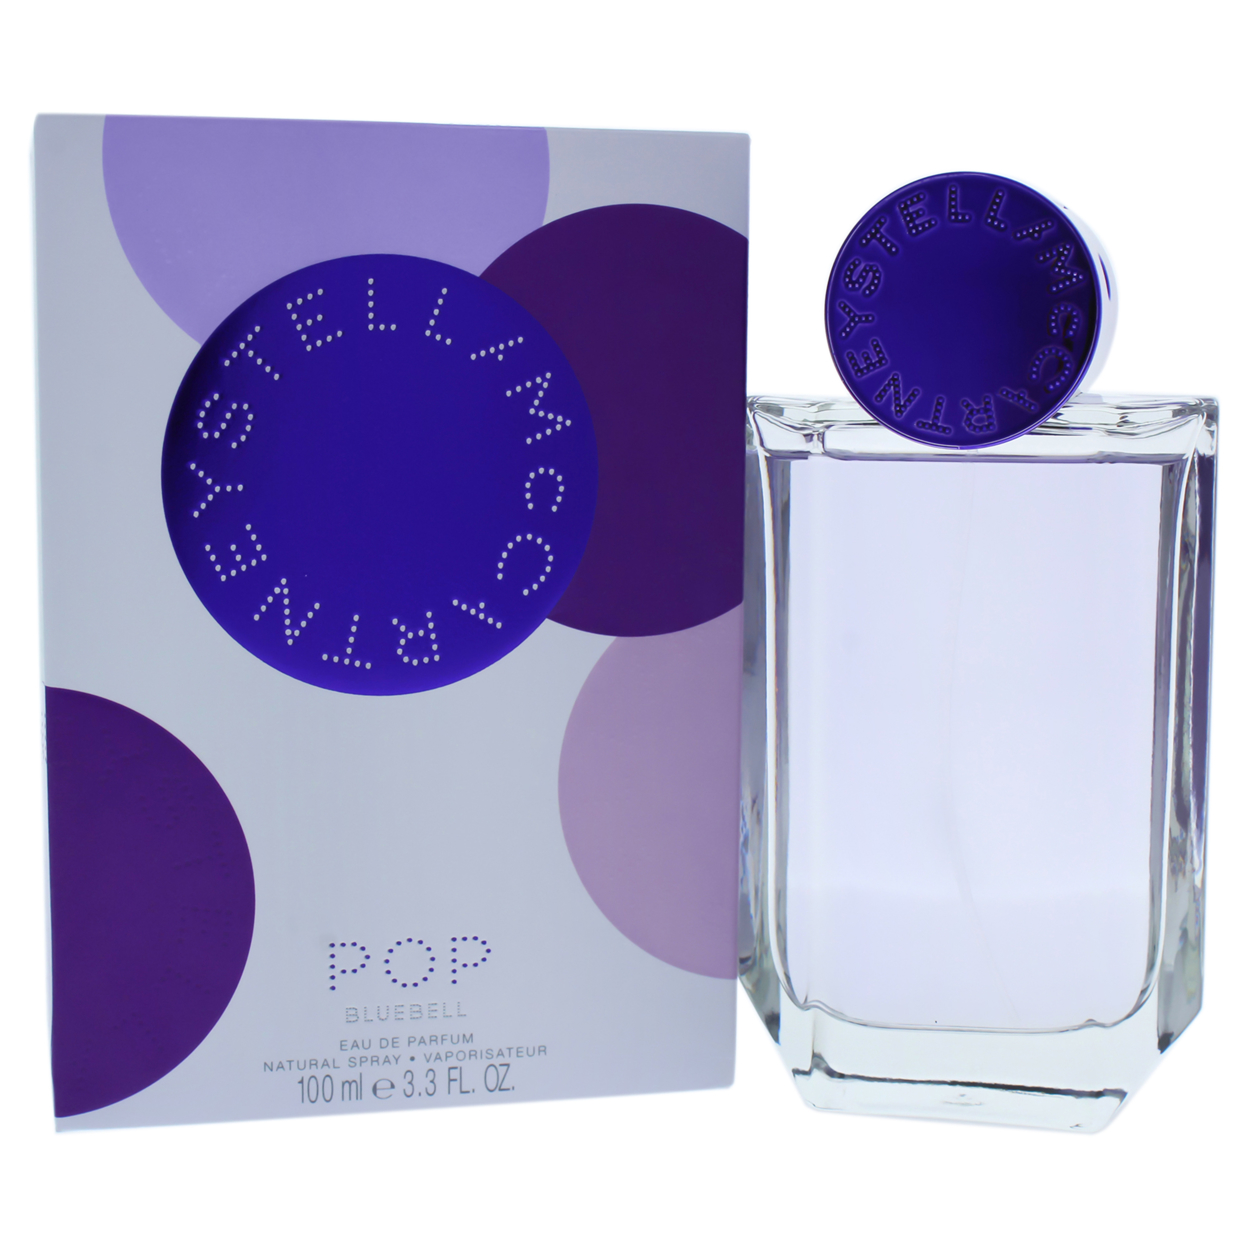 Pop Bluebell by Stella McCartney for Women - 3.3 oz EDP Spray цена 2017